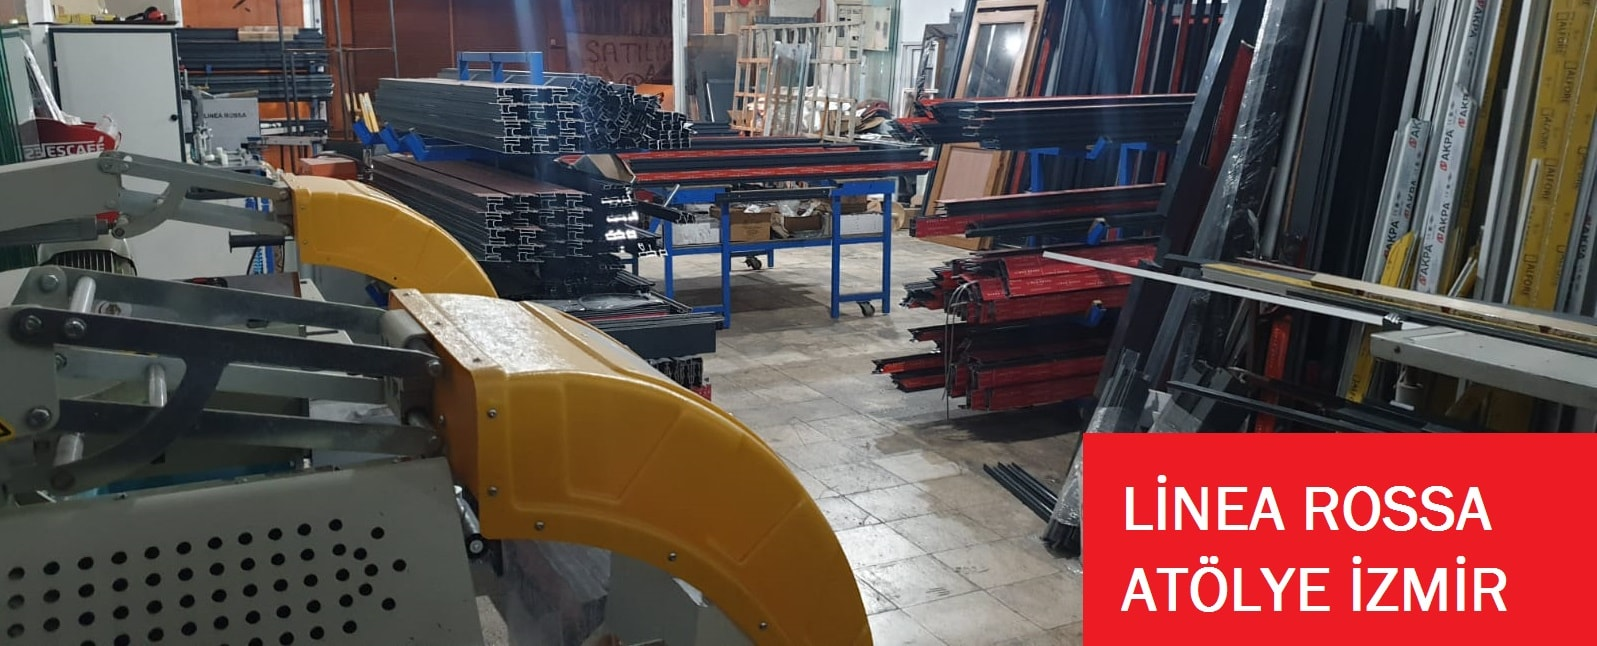 linea rossa üretici bayii İzmir